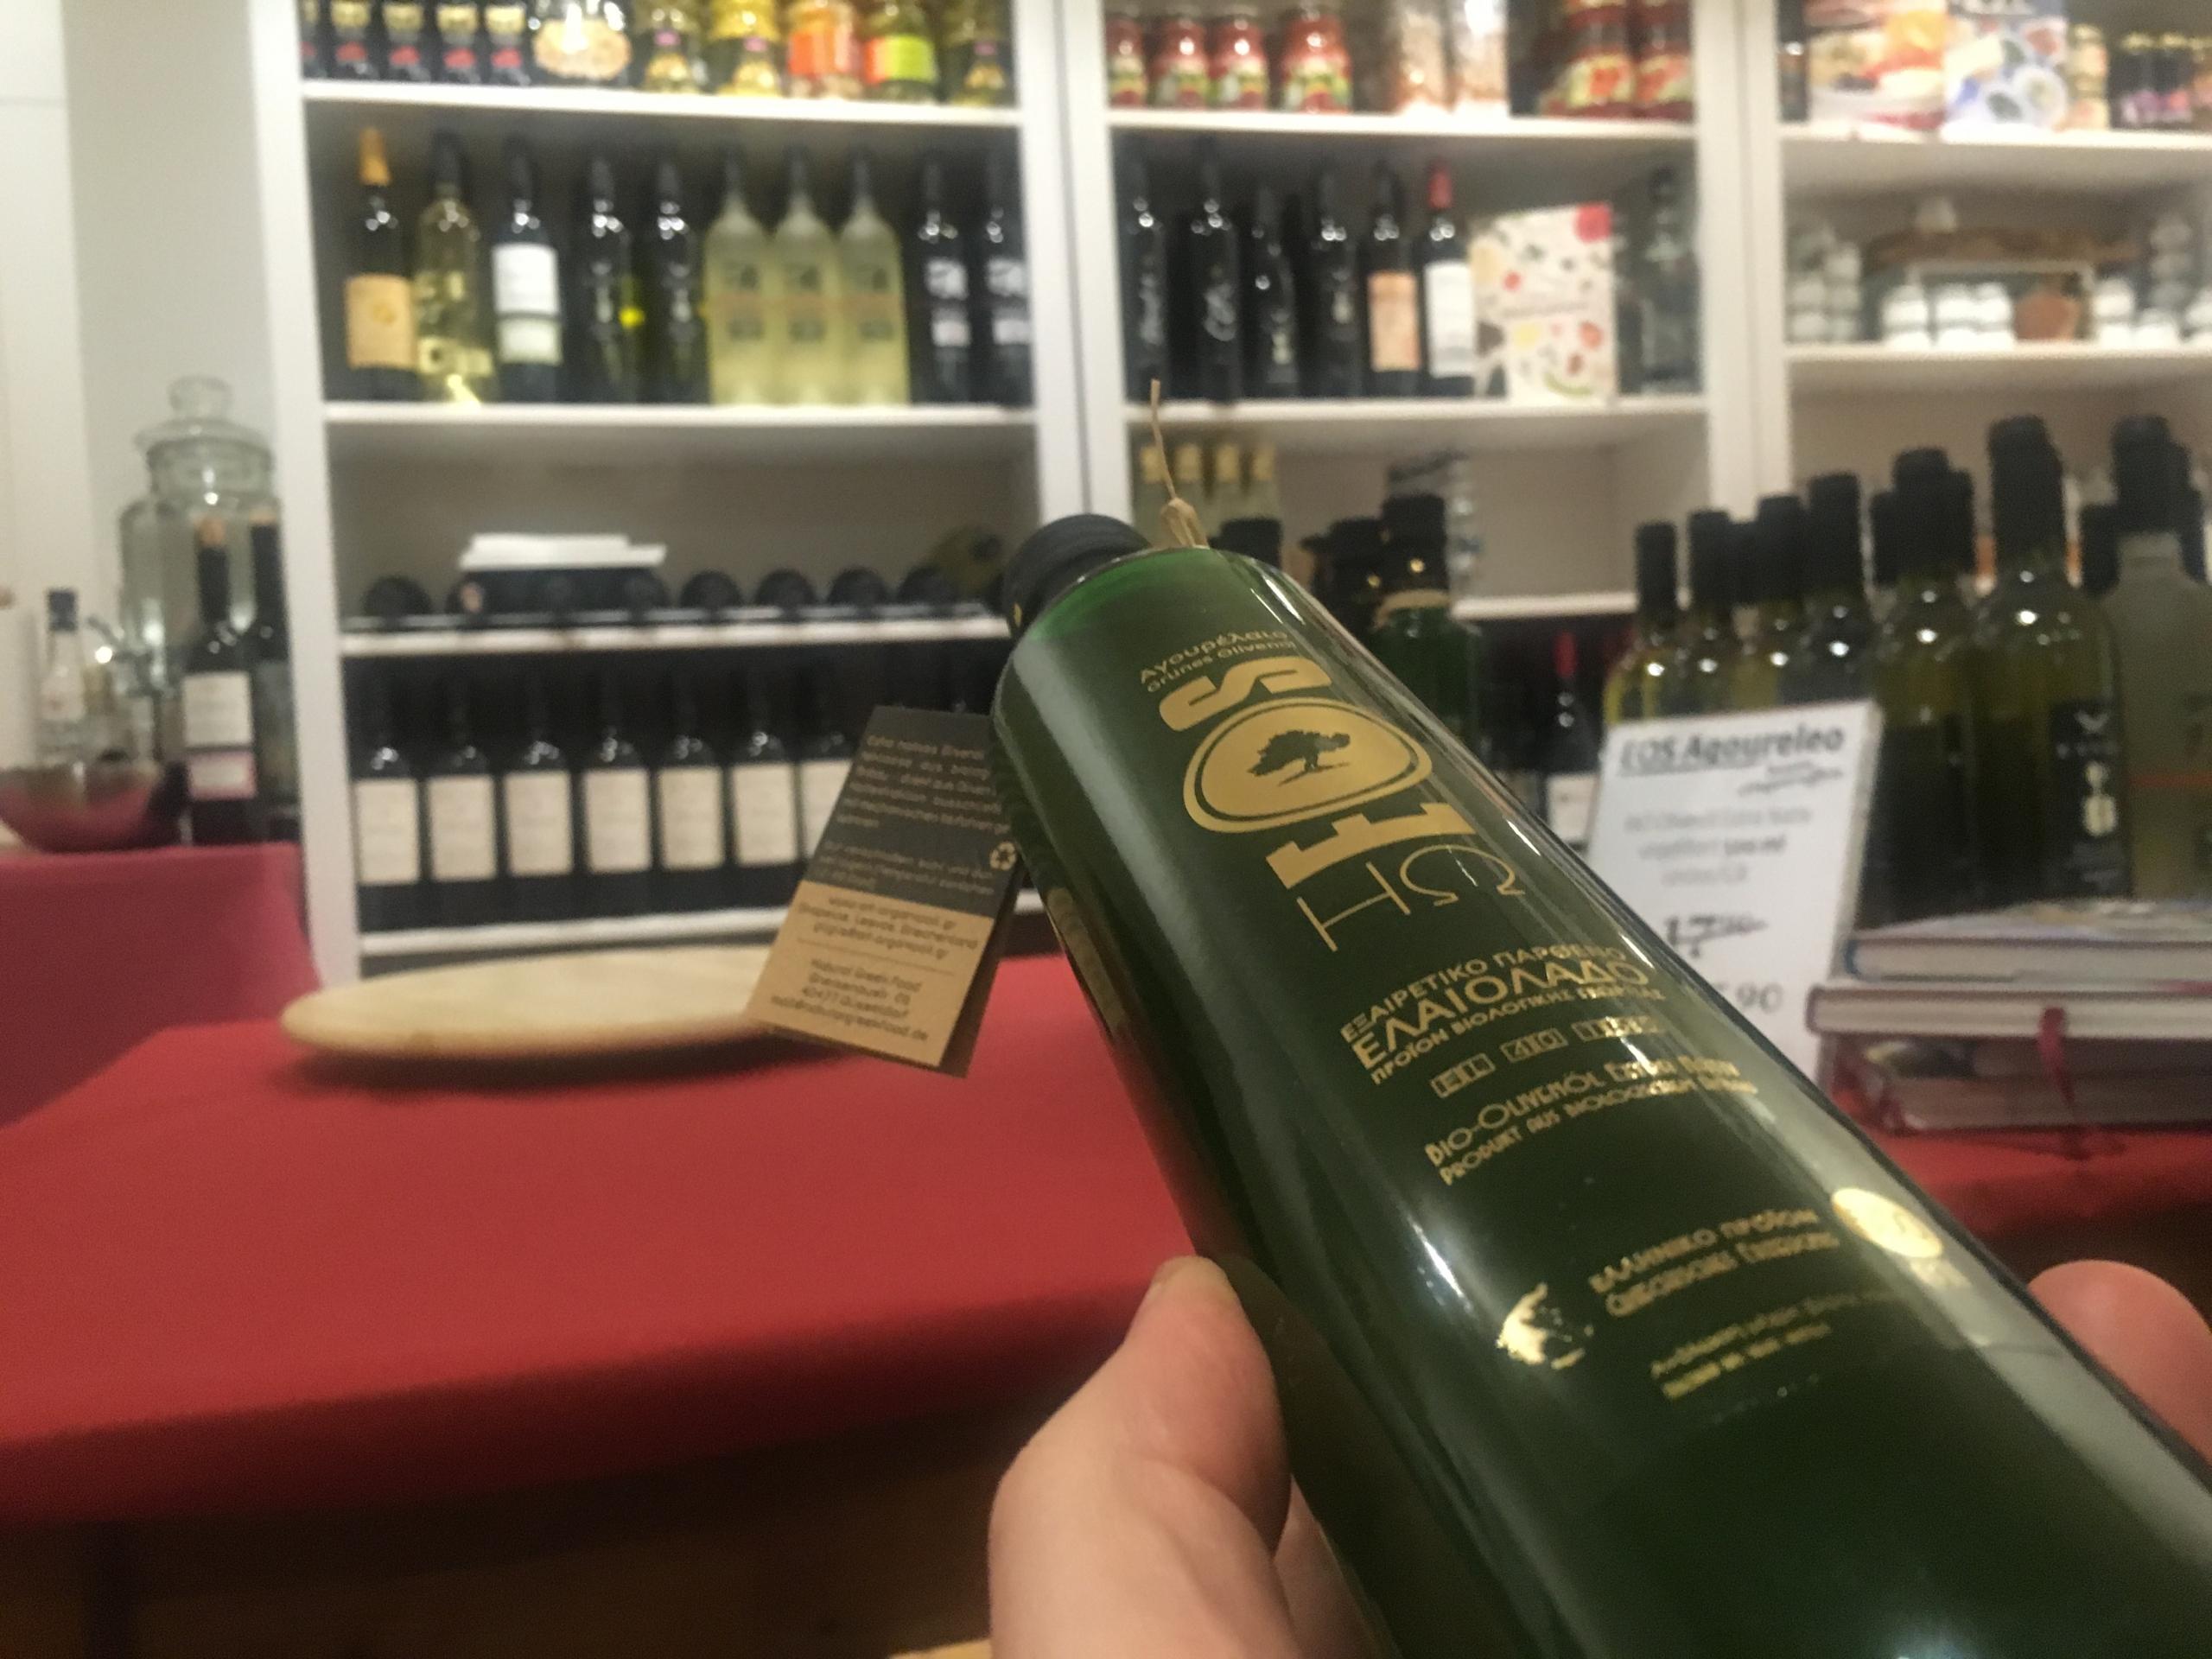 Geras-Bio-Olivenöl erhält international Silber